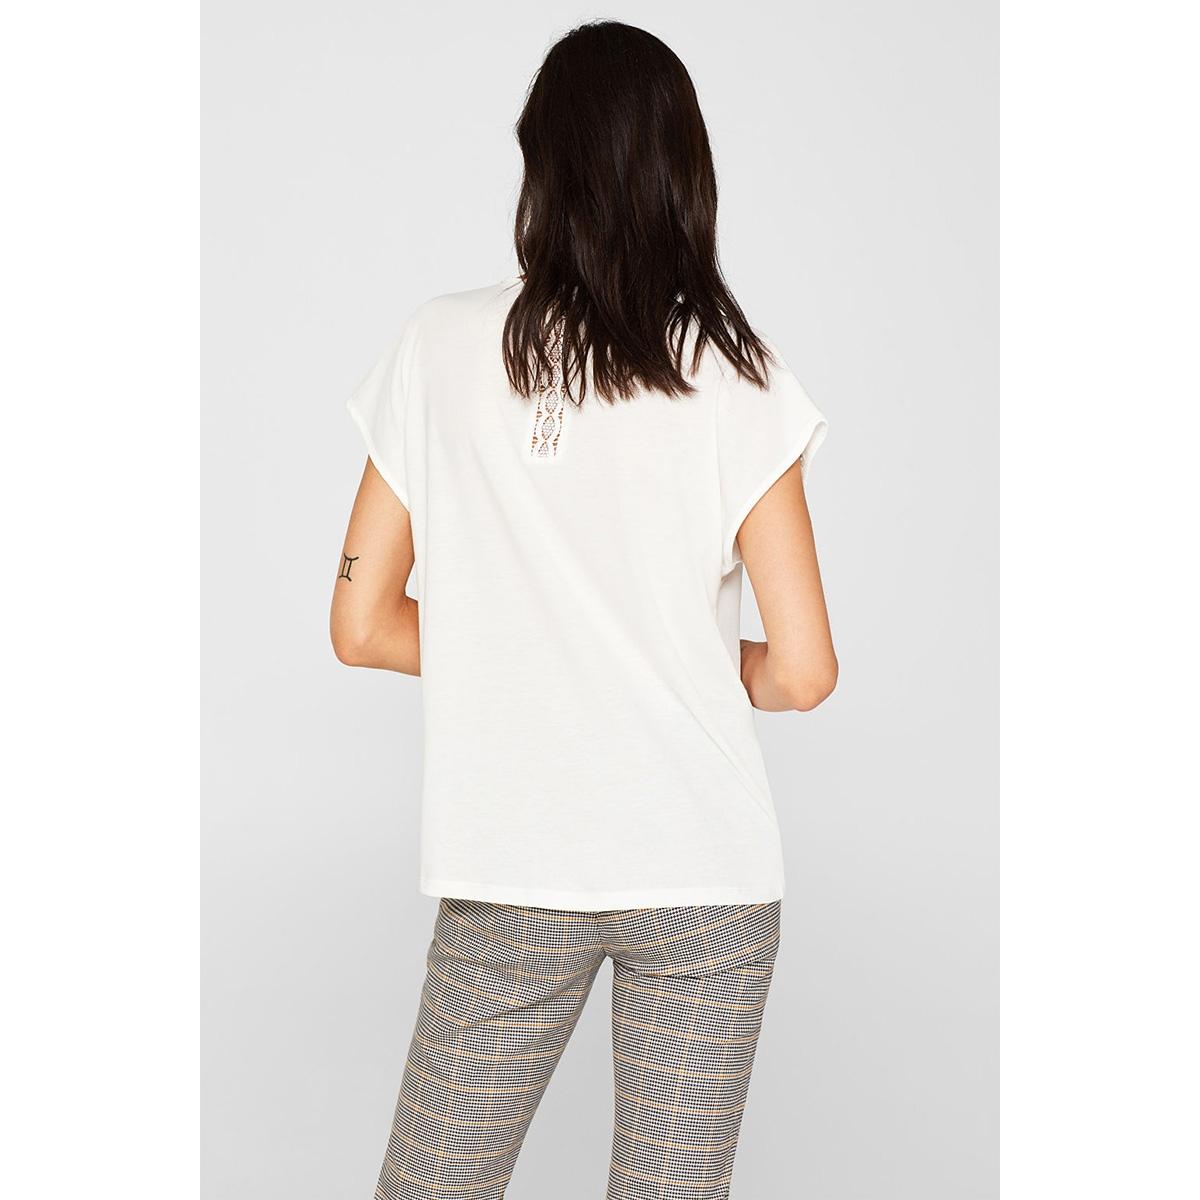 fashion t shirt 079eo1k003 esprit collection t-shirt e110 off white